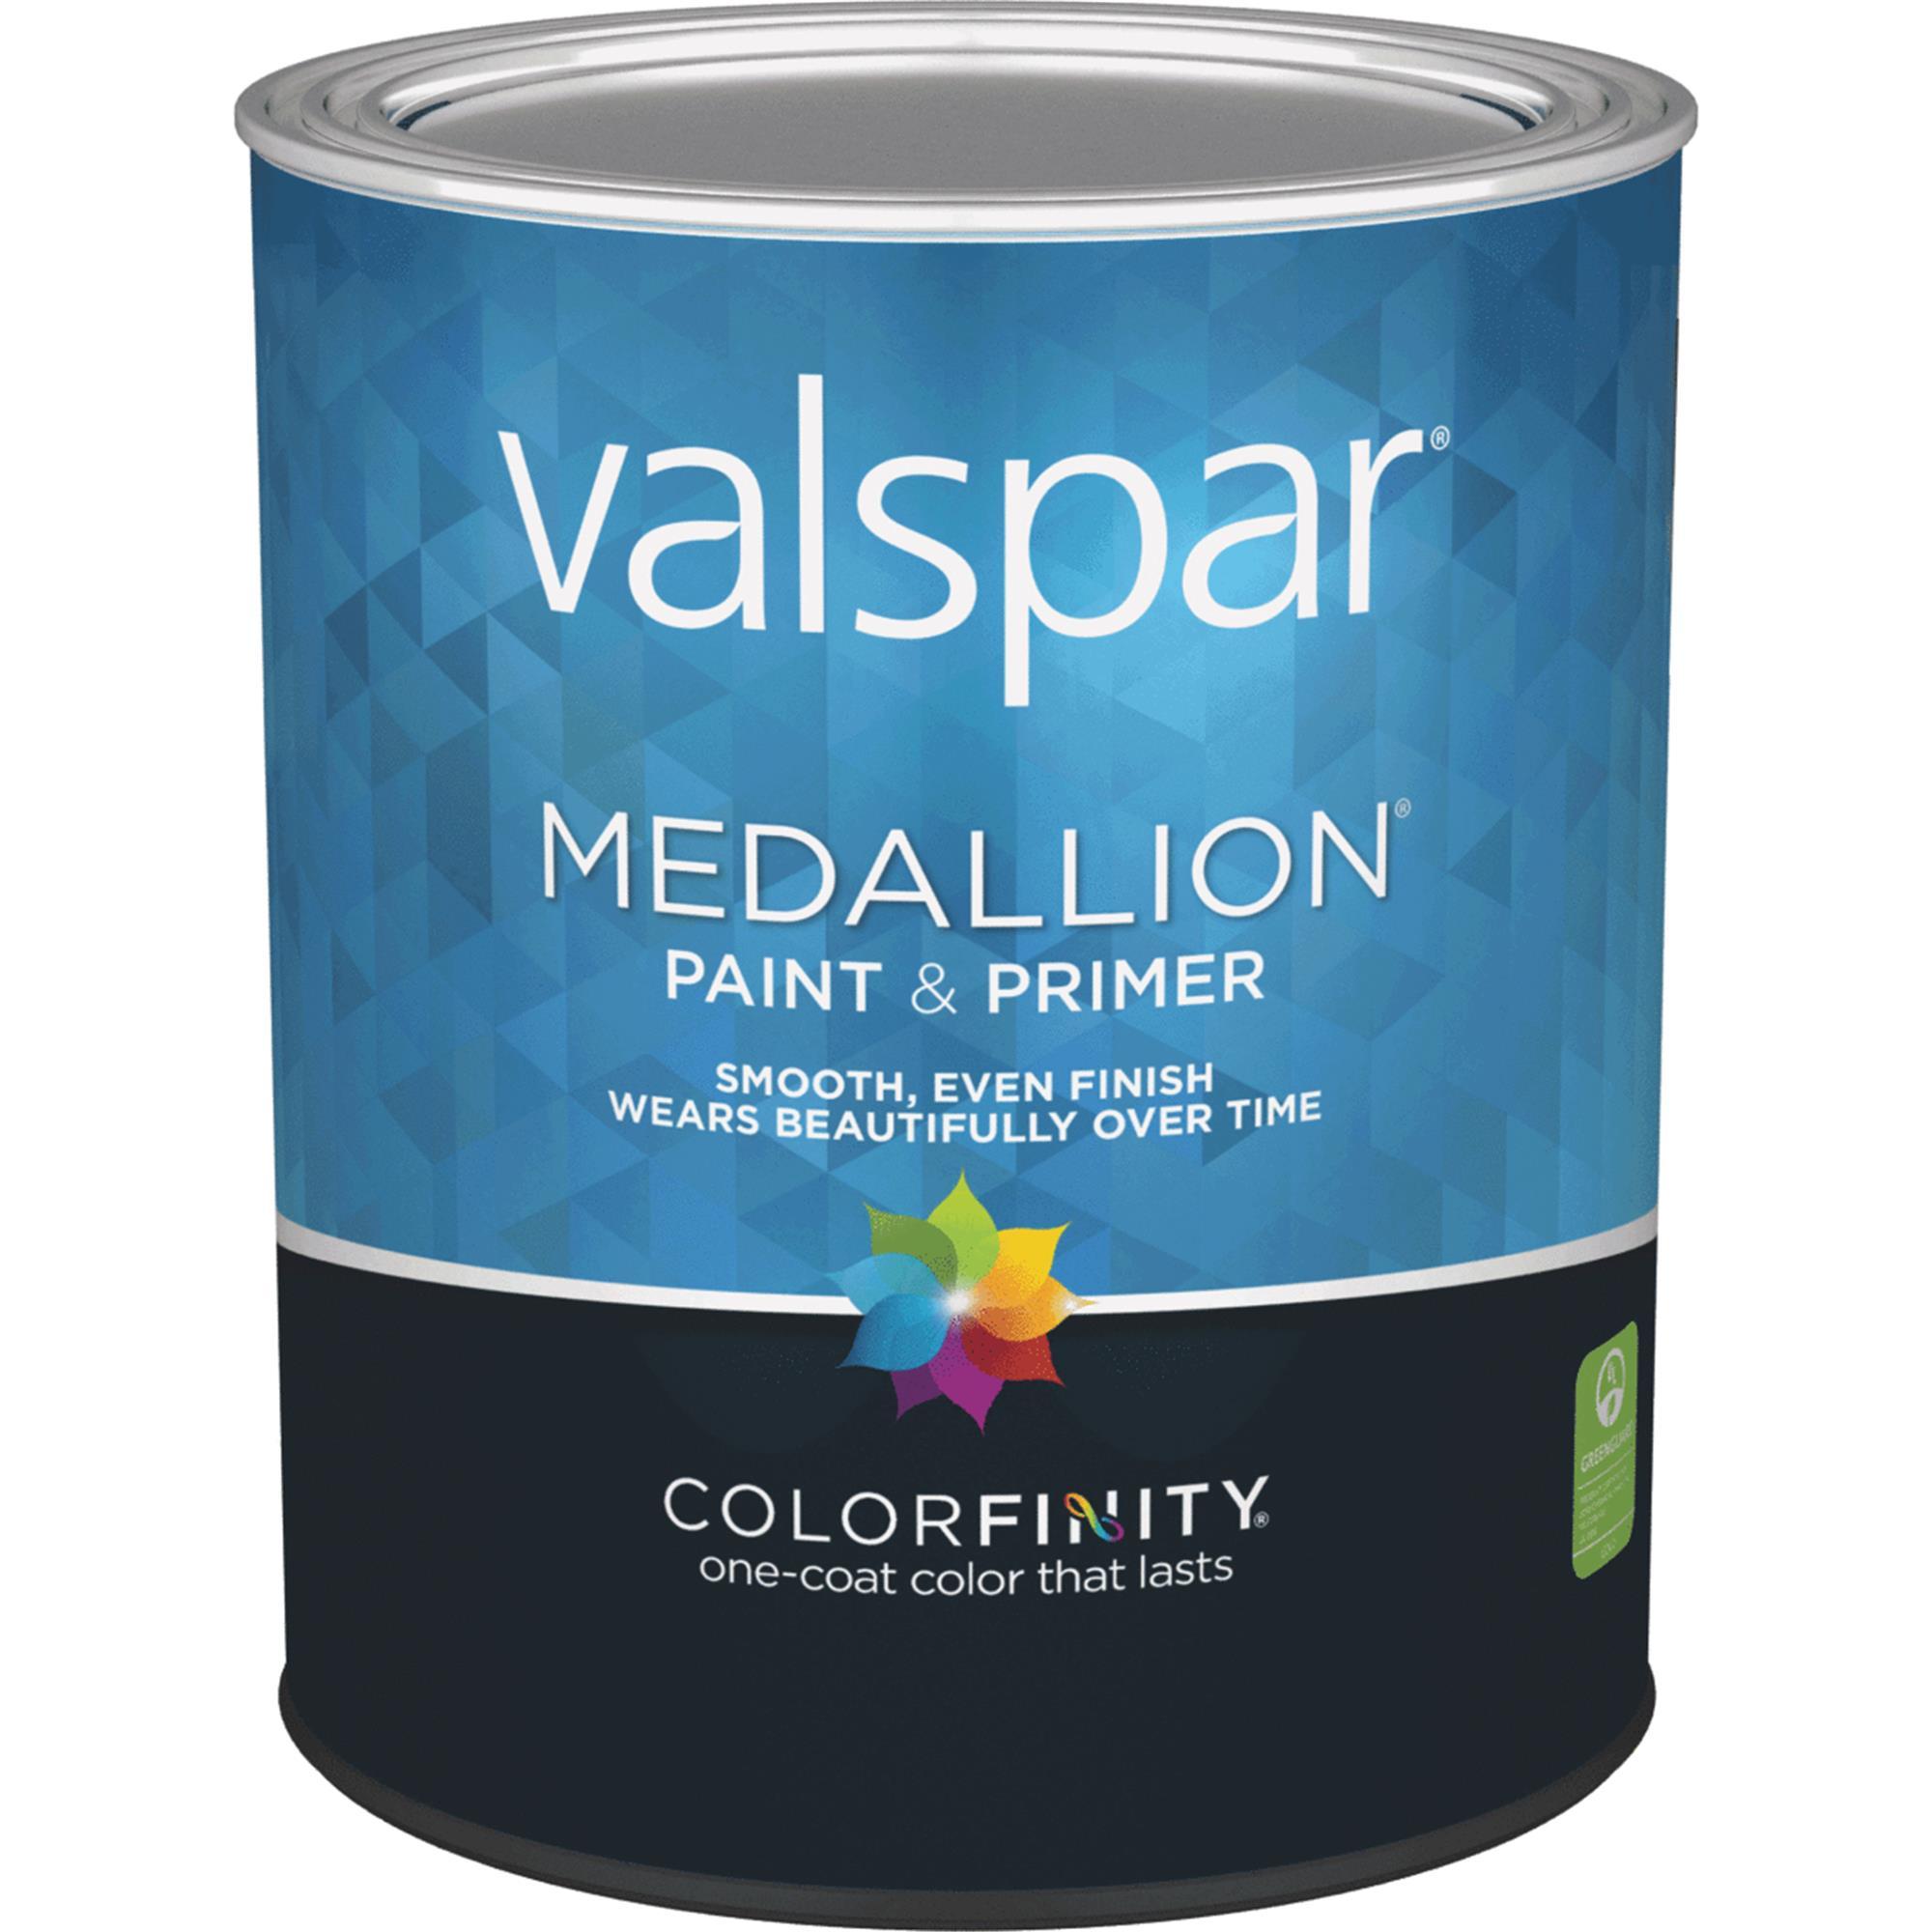 Valspar Medallion 100% Acrylic Paint & Primer Flat Interior Wall Paint